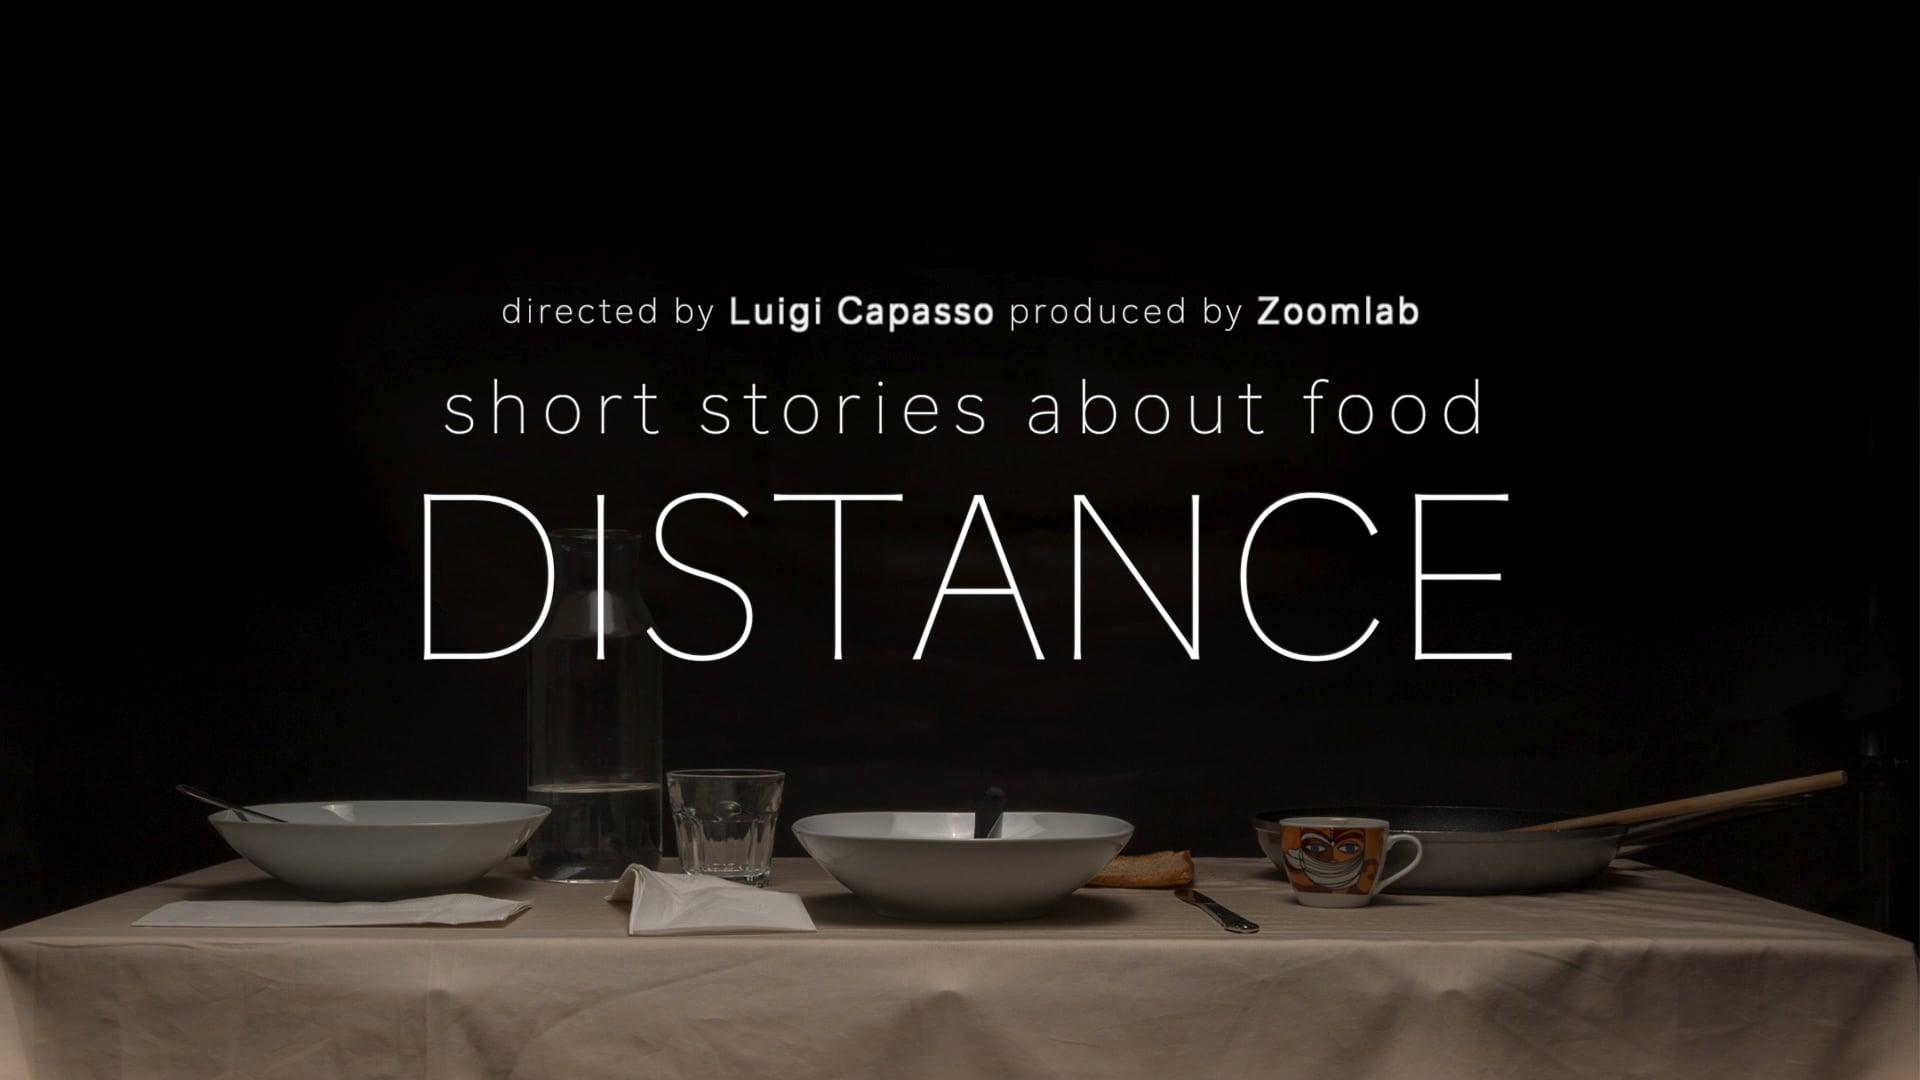 Official trailer_Distance_Luigi Capasso_FFFNYC